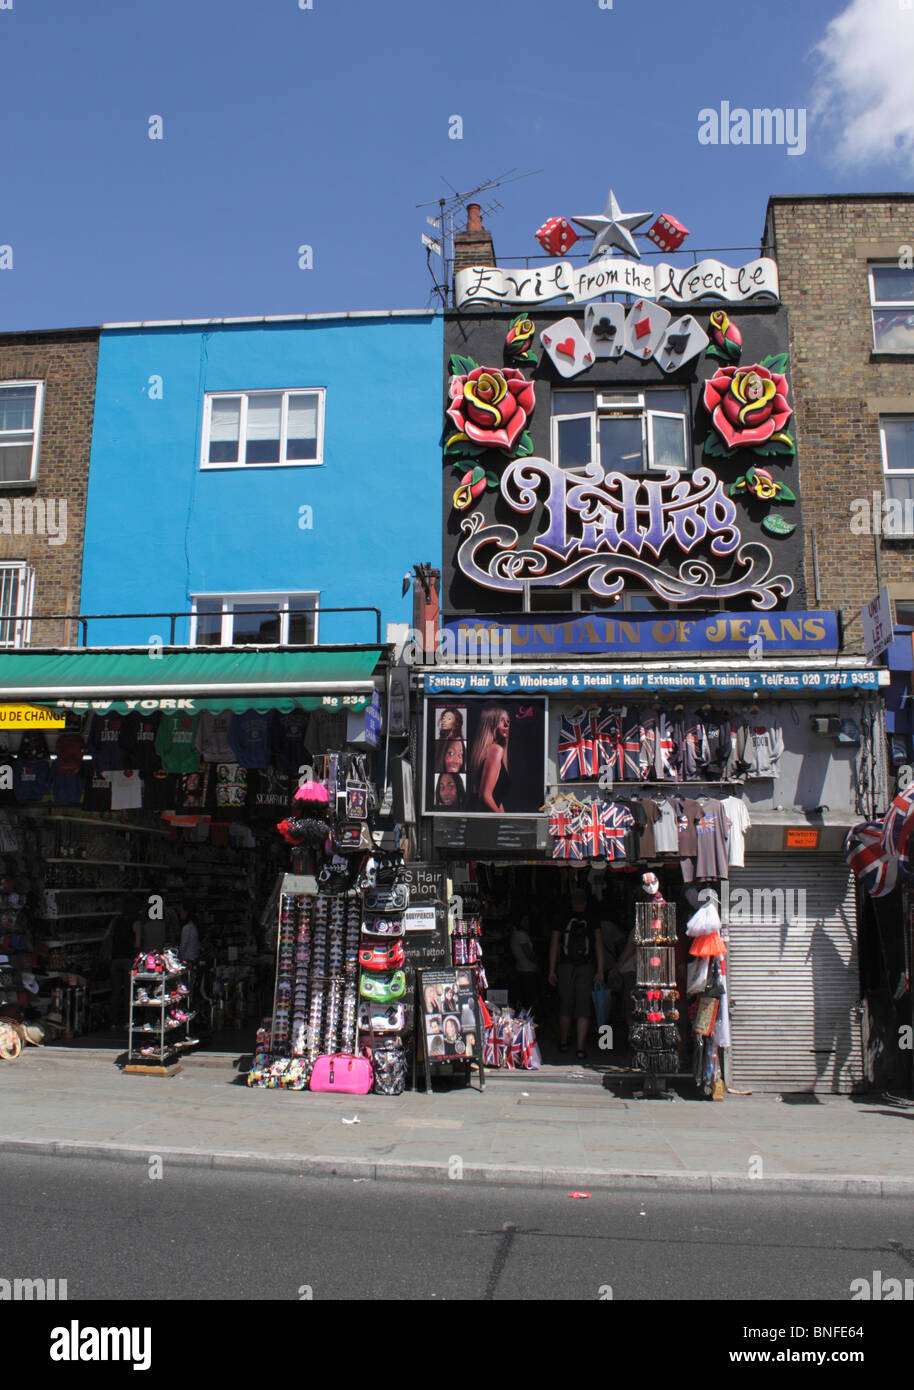 Fashion And Tattoo Shops Along Camden High Street London July 2010